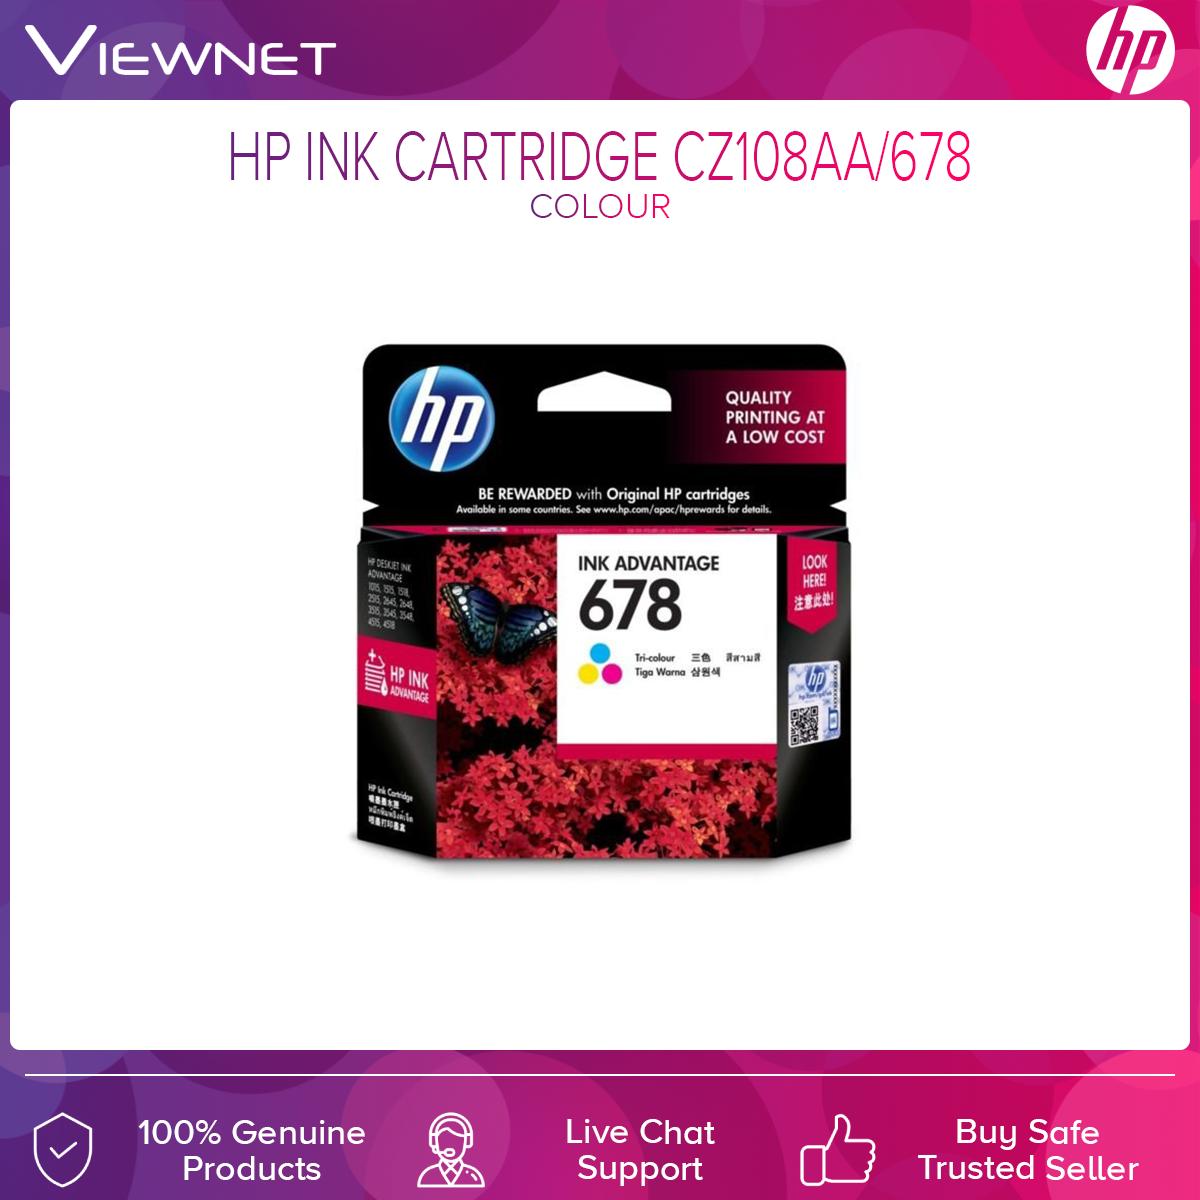 HP 678 Original Ink Advantage Cartridge CZ108AA/678 Ink (Tri-Color)